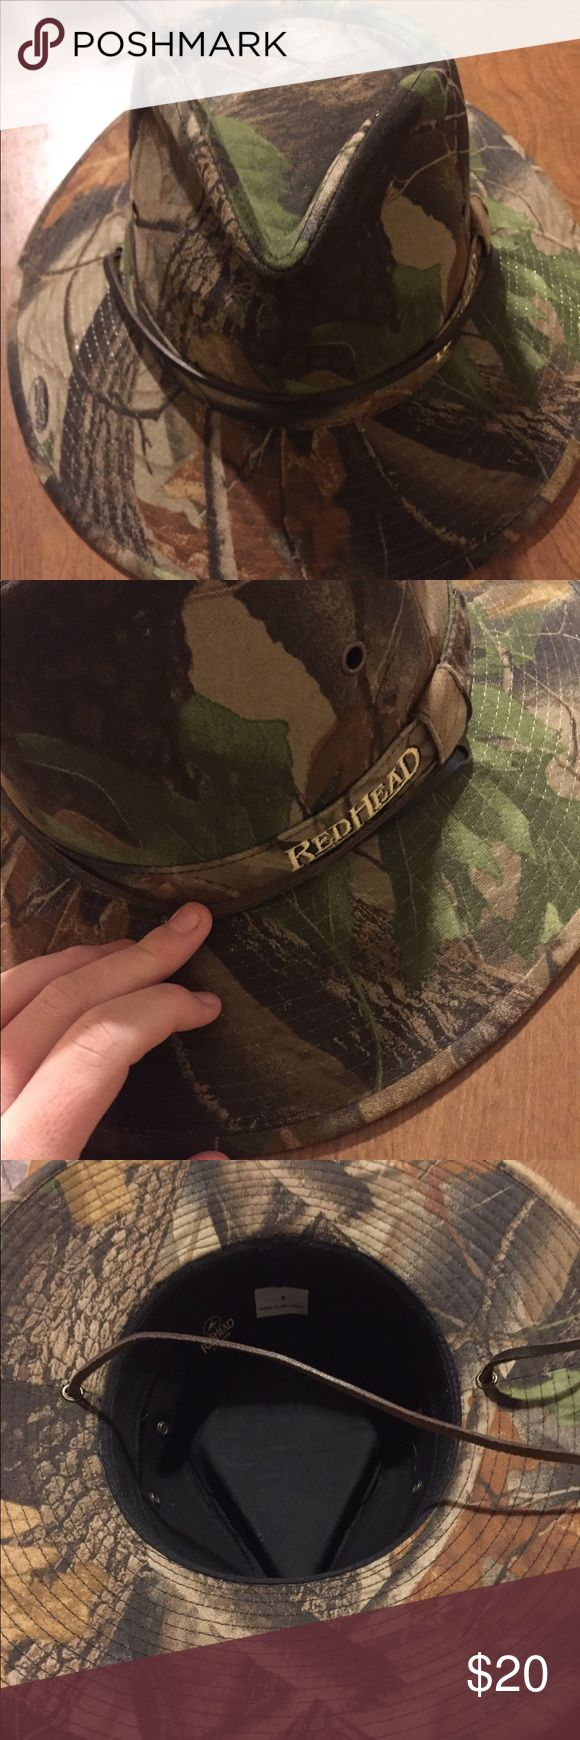 Redhead camo bucket hat Brand new. Men's size small camo hat redhead Accessories Hats